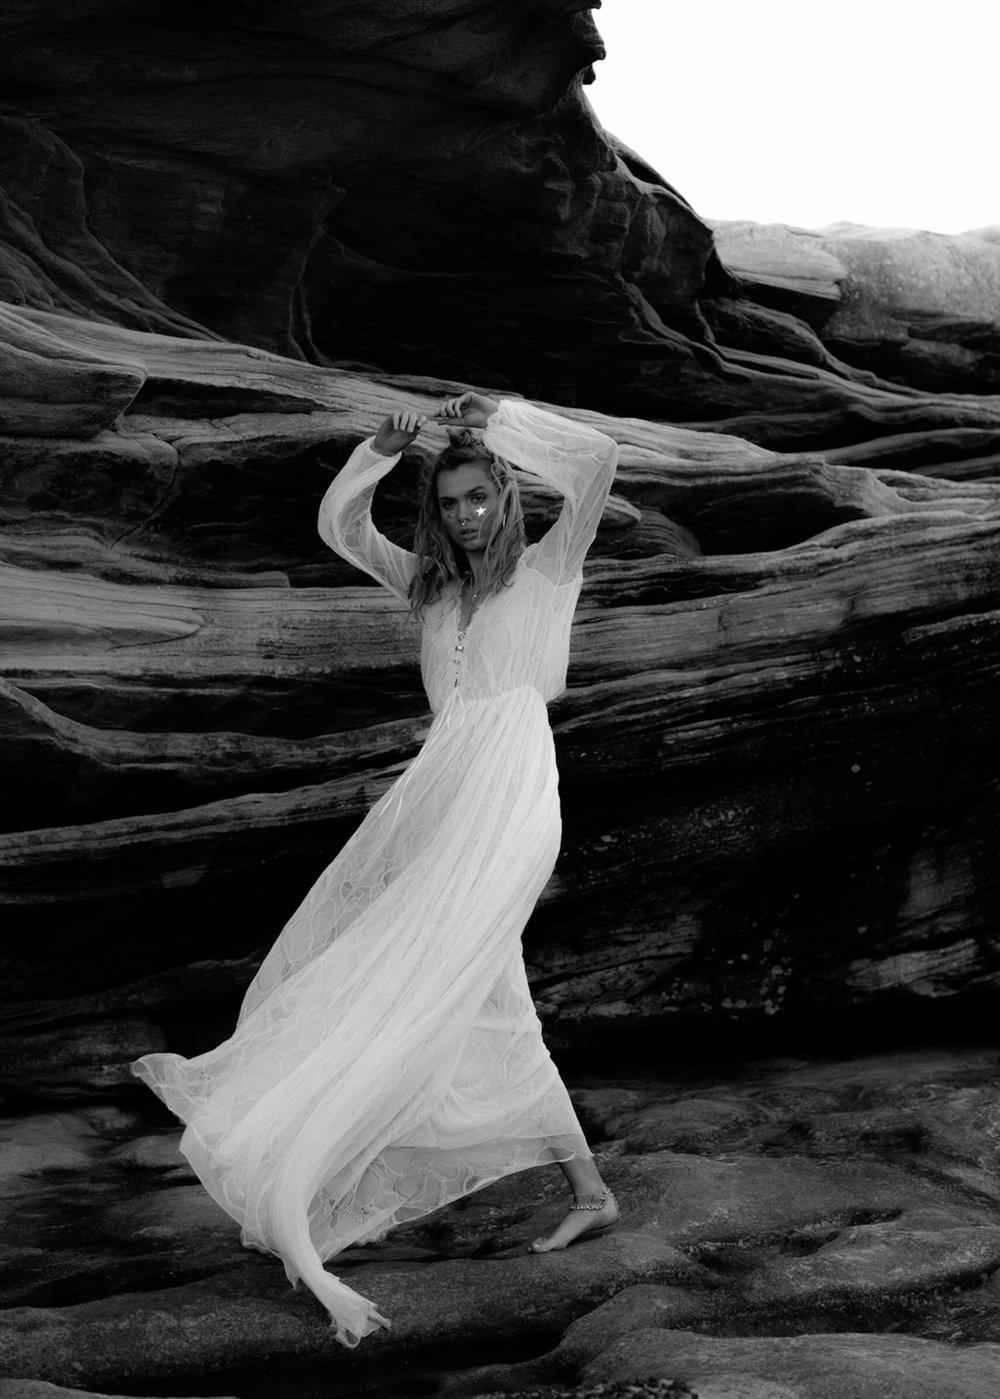 Windswept-8.jpg